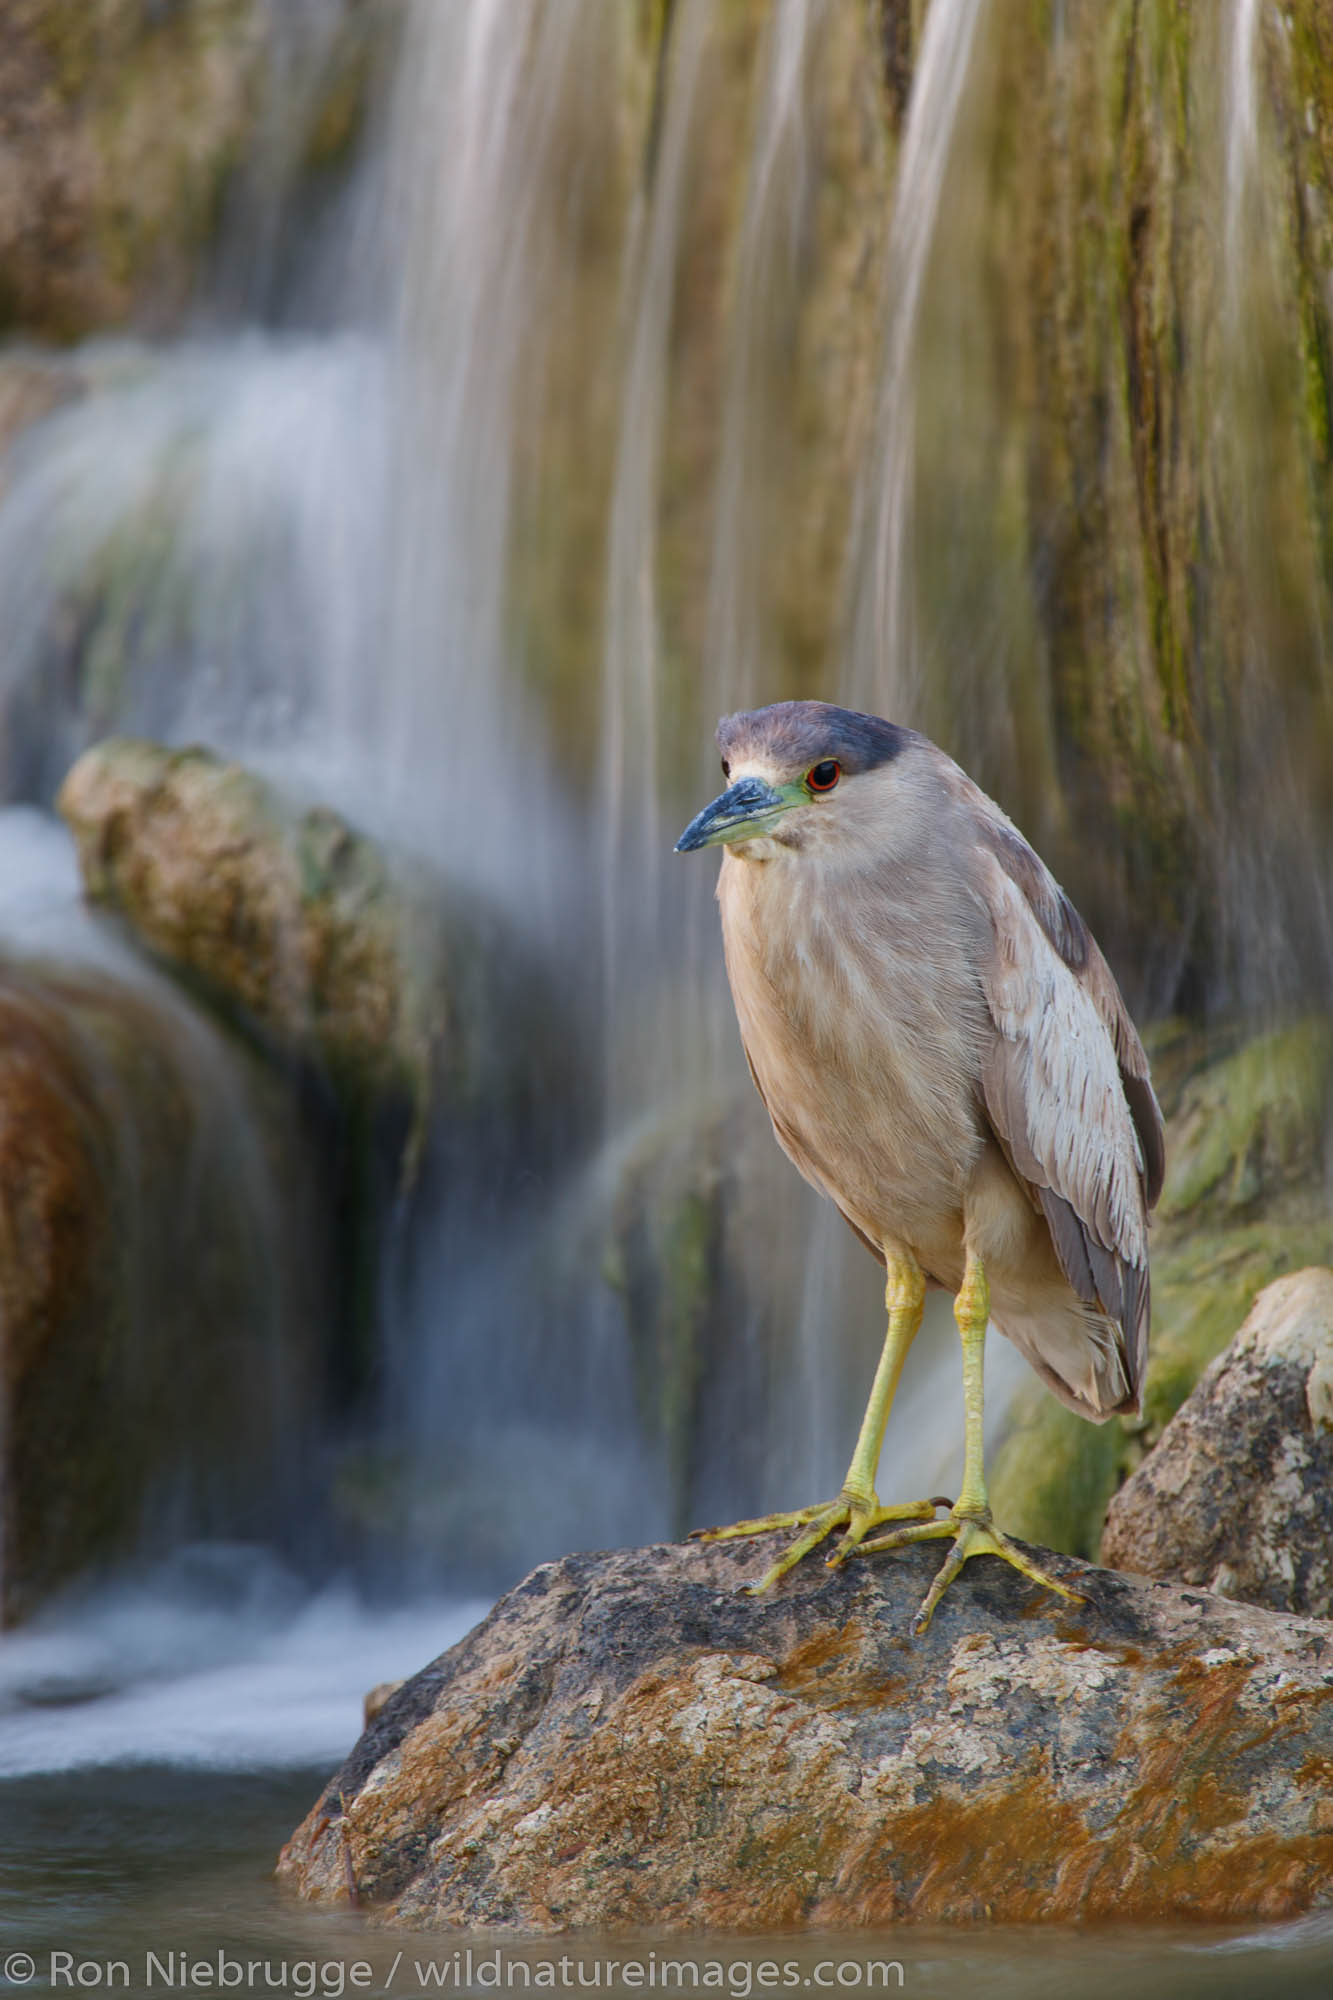 black-crowned night heron (Nycticorax nycticorax), Borrego Springs, California.